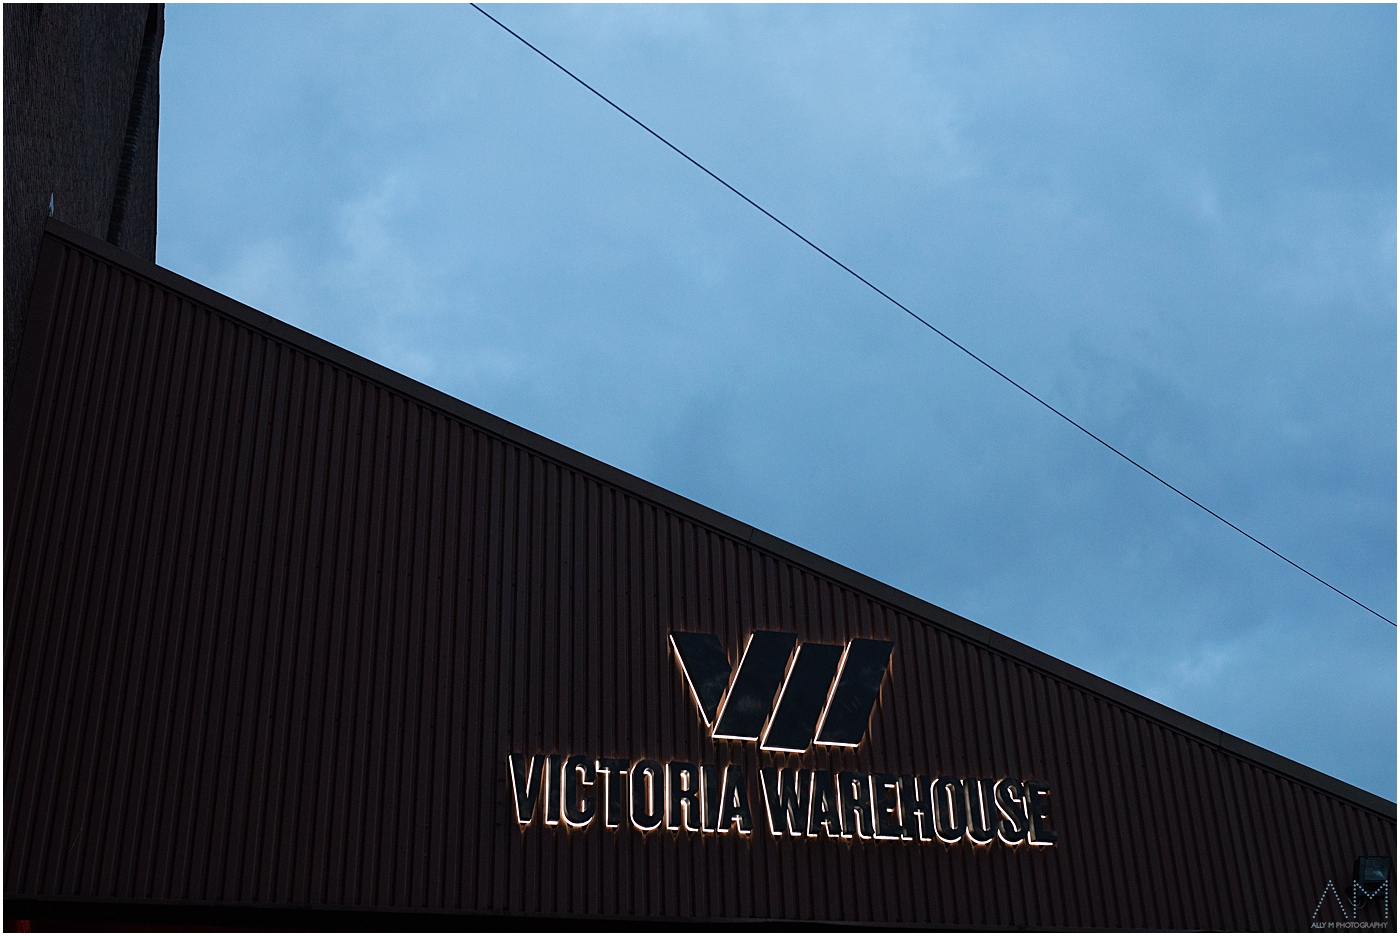 Victoria warehouse at night